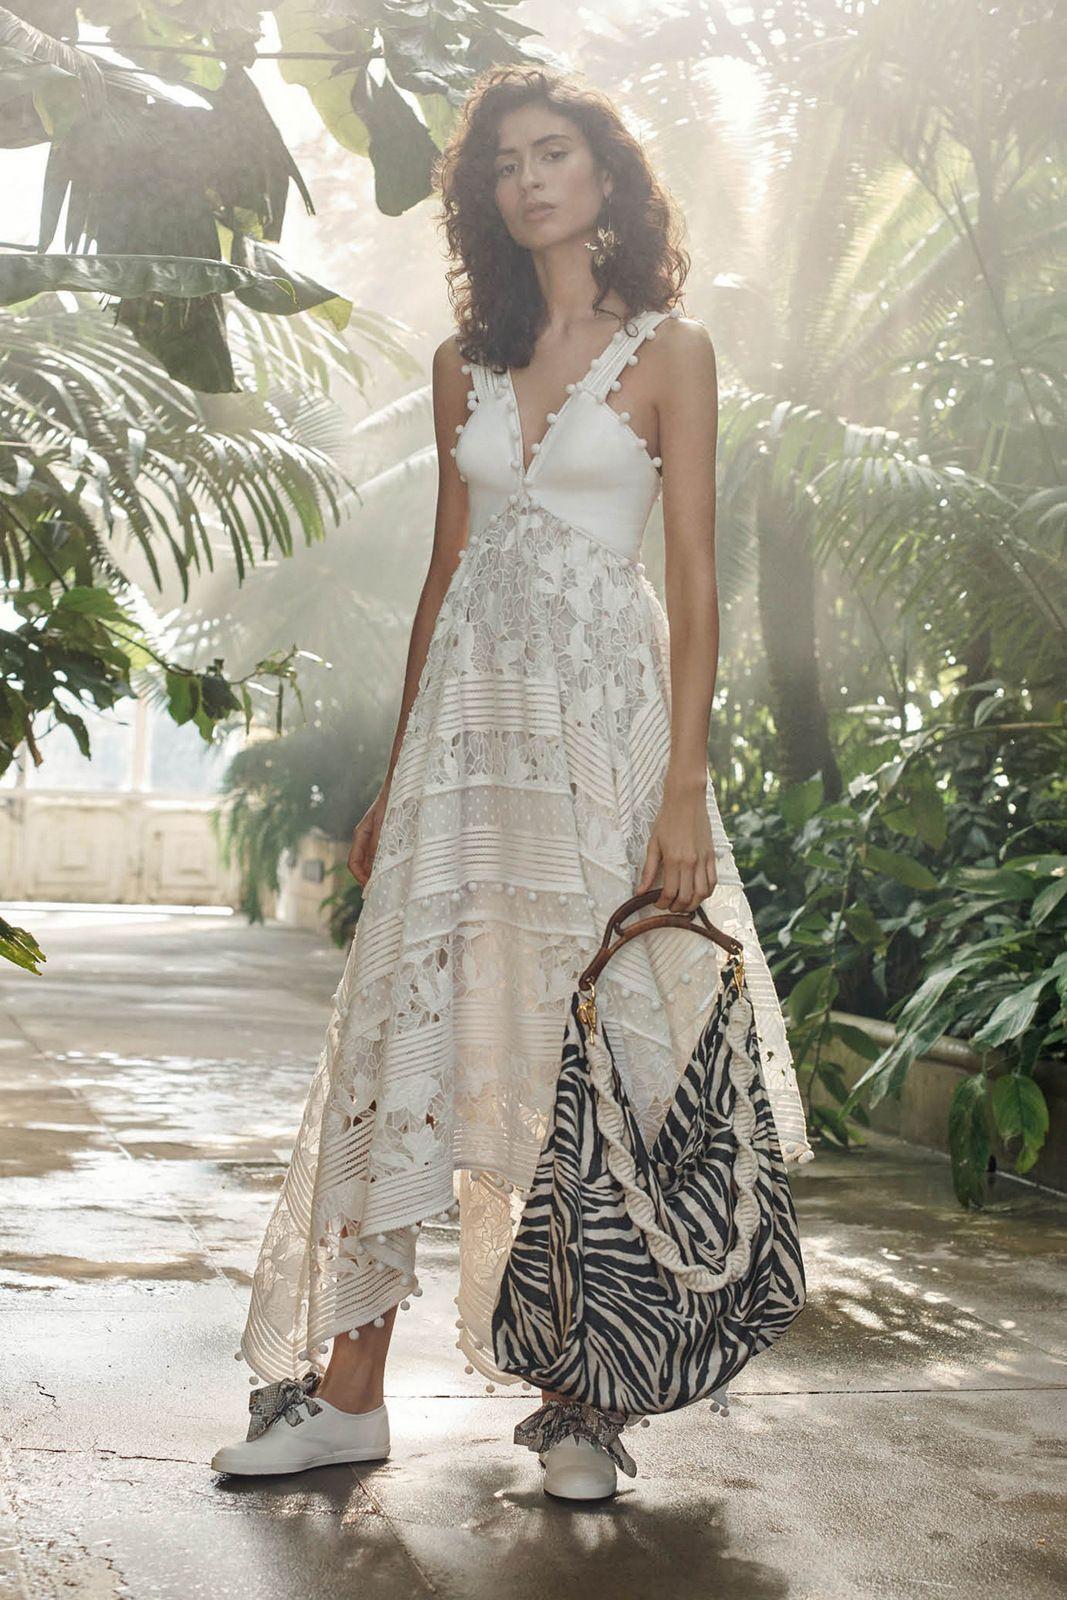 1e39c41fa6fd Zimmermann Resort 2019 - ss19 white lace dress white sneakers zebra bag  designer outfit